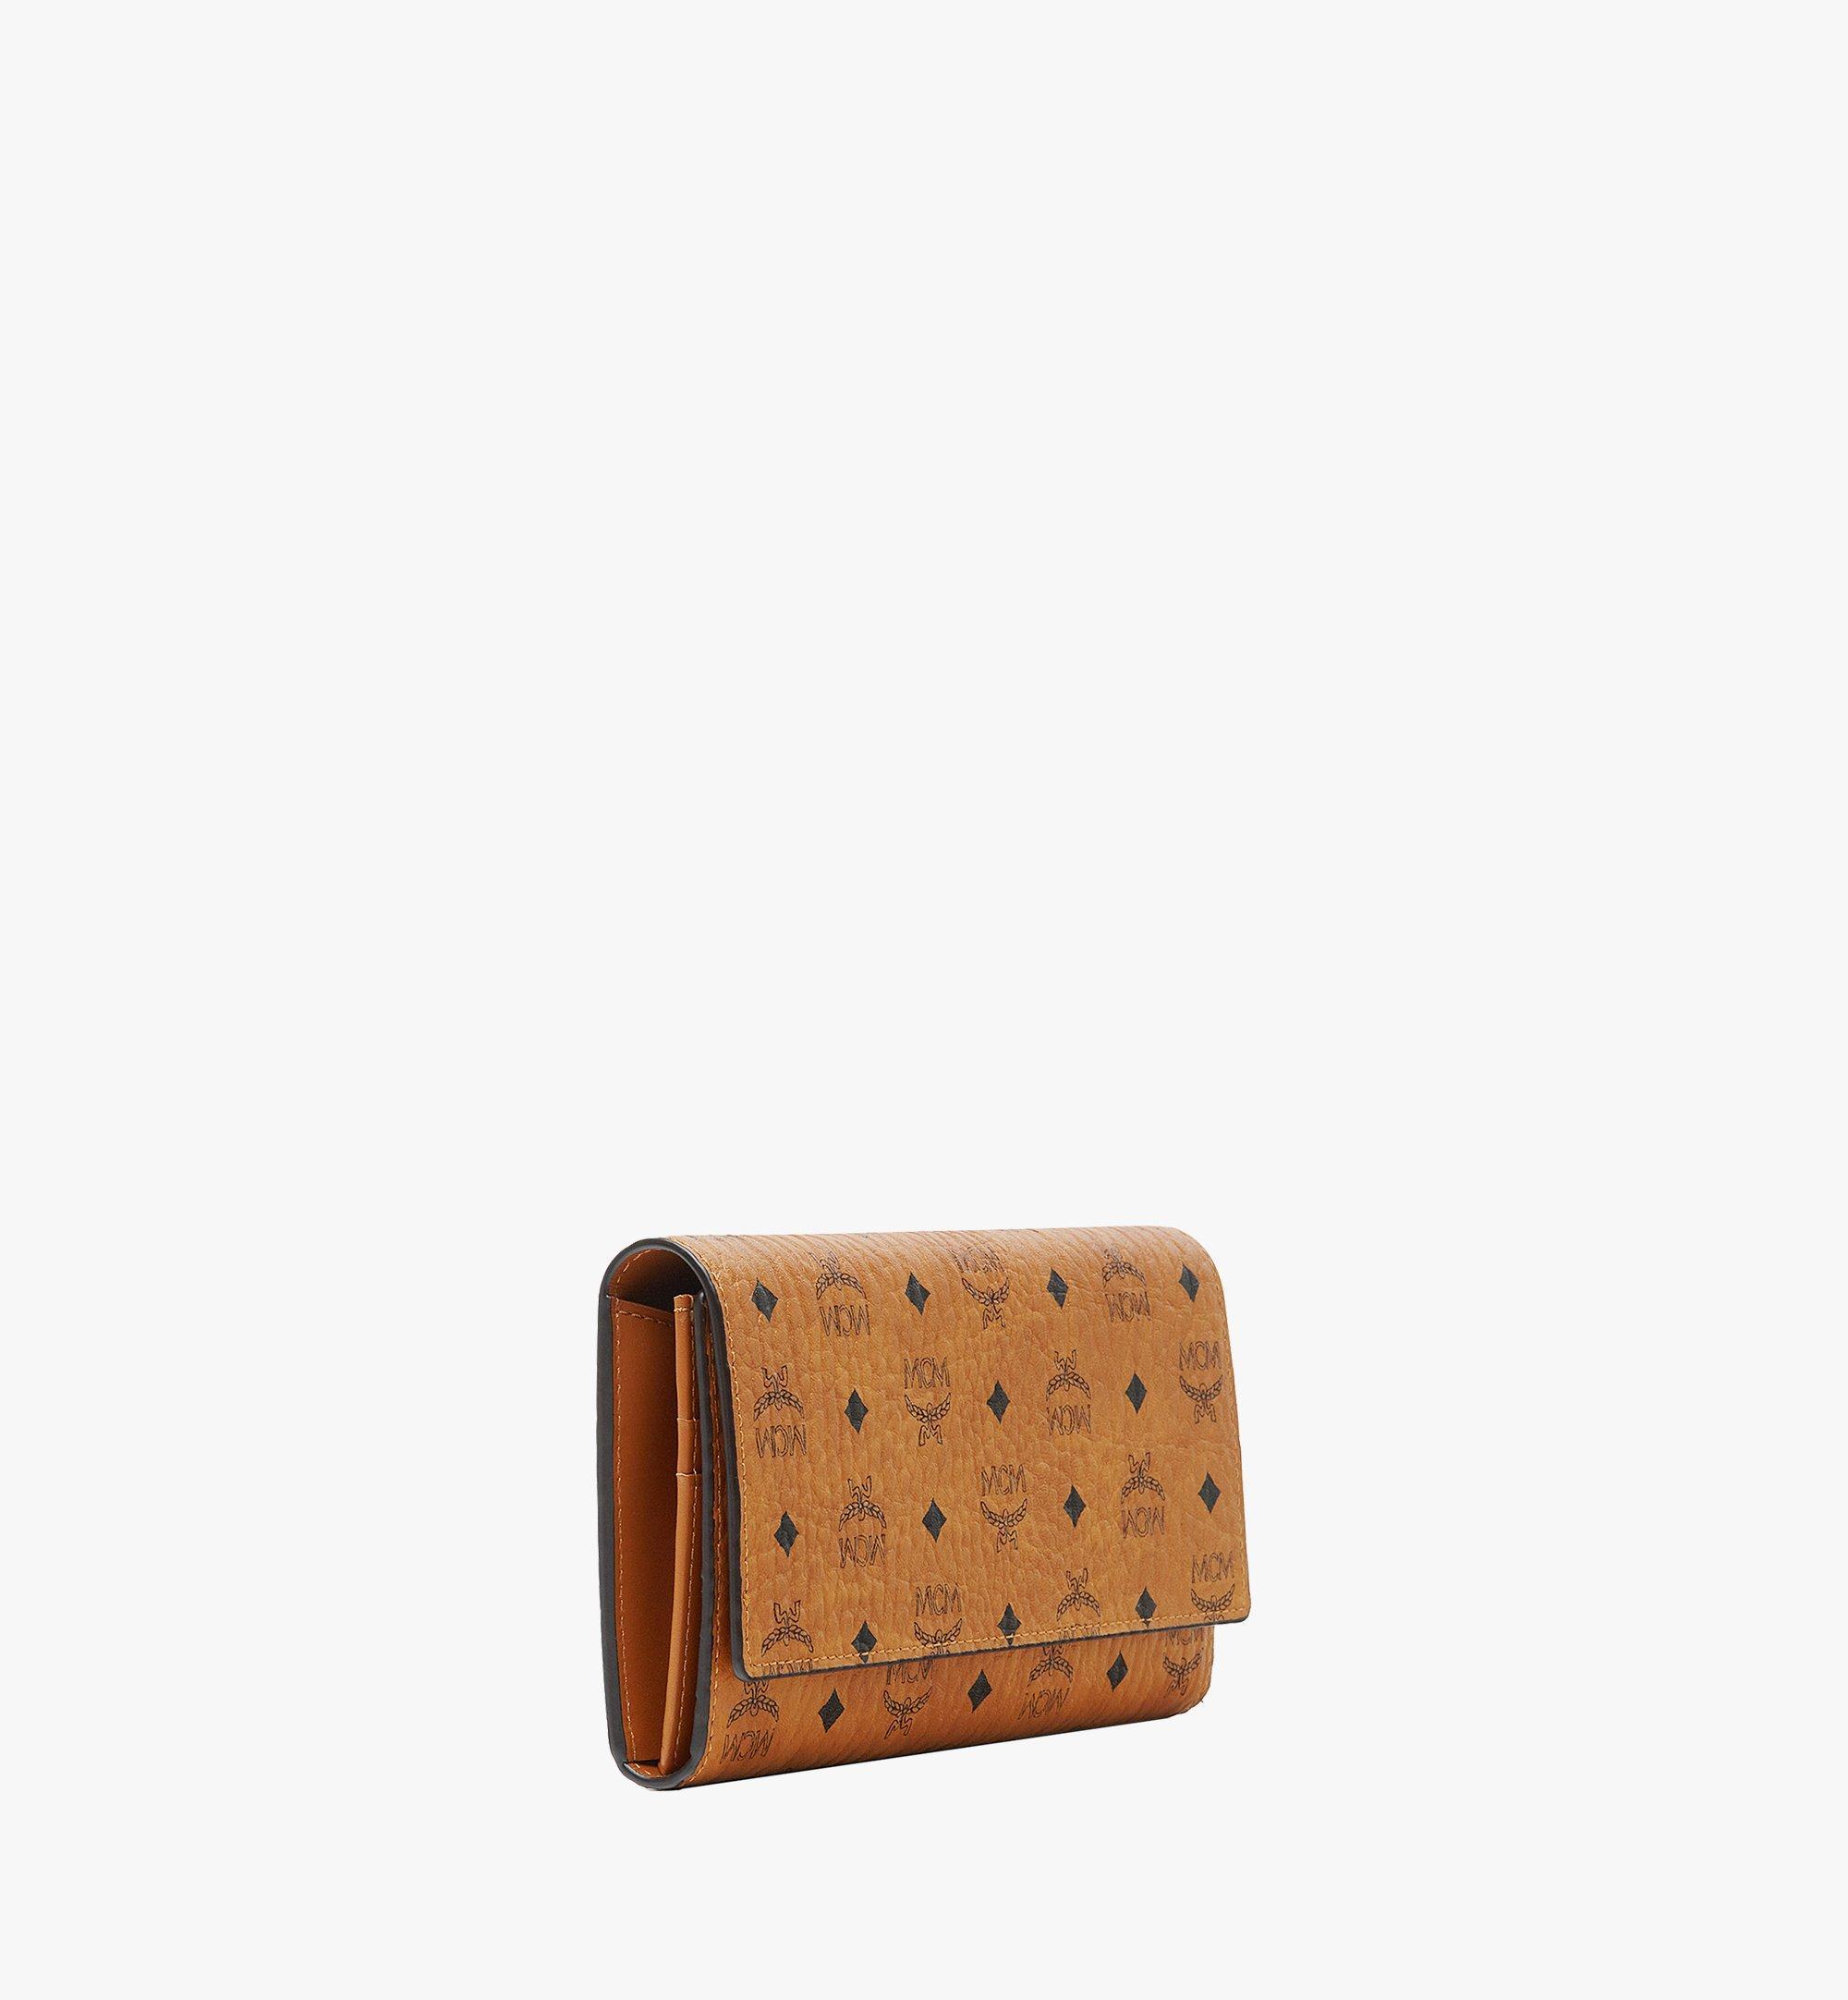 MCM Trifold Wallet in Visetos Original Cognac MYLAAVI01CO001 Alternate View 1